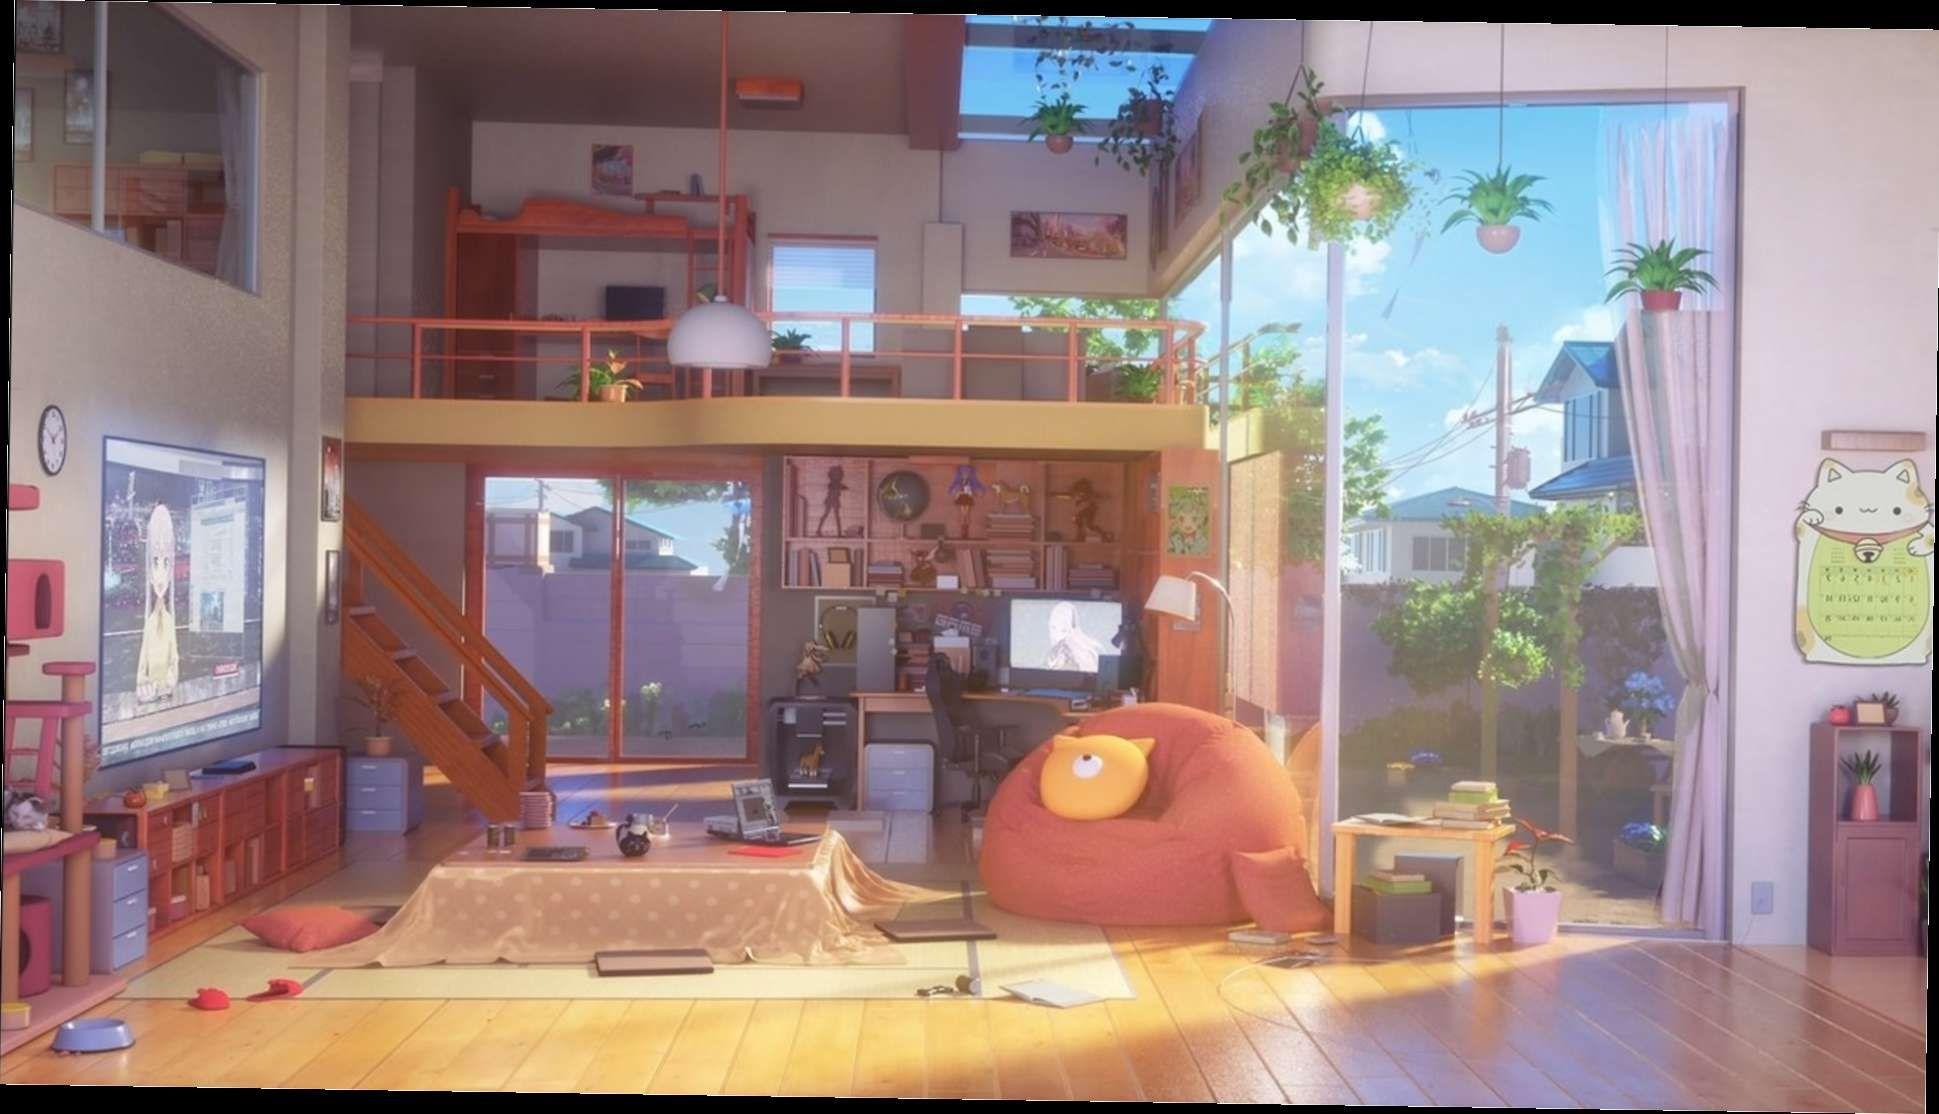 30 Anime Backgrounds Anime Living Room Hd Wallpaper Background Image 1920x1080 Id 995155 Anime Background Wallpaper Backgrounds Background Images